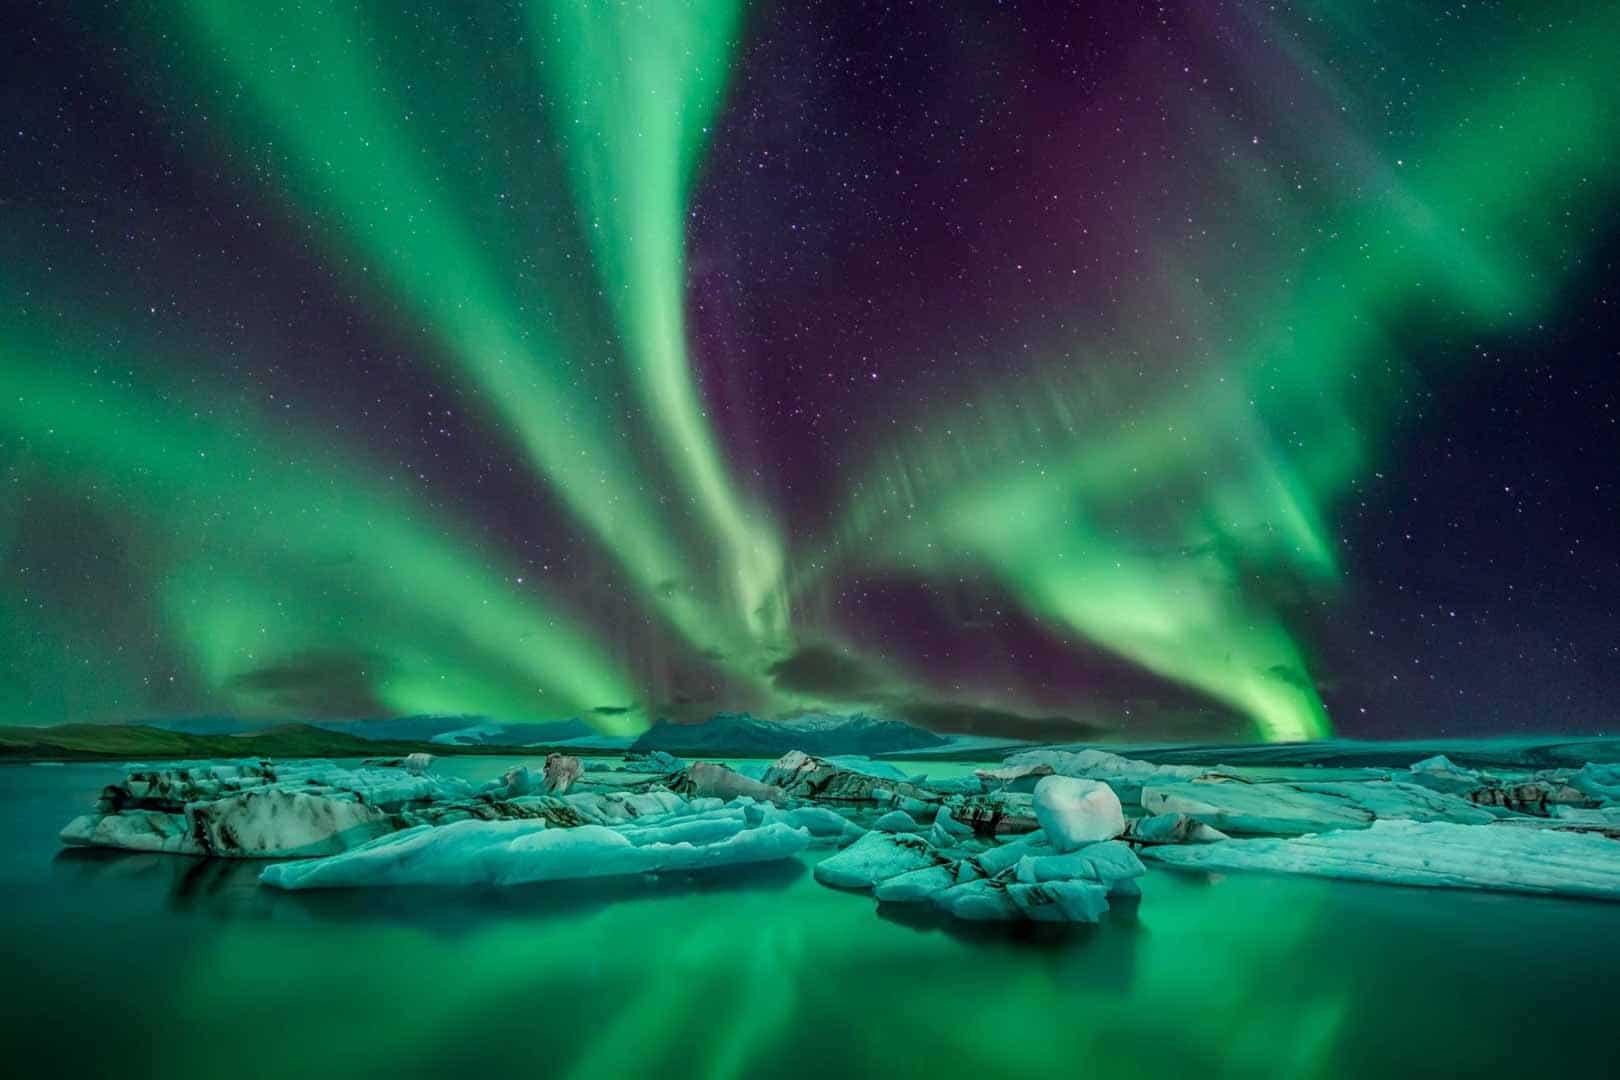 Fantastic Northern Lights Dancing in the dark skies over Jökulsárlón Glacier Lagoon in South East Iceland